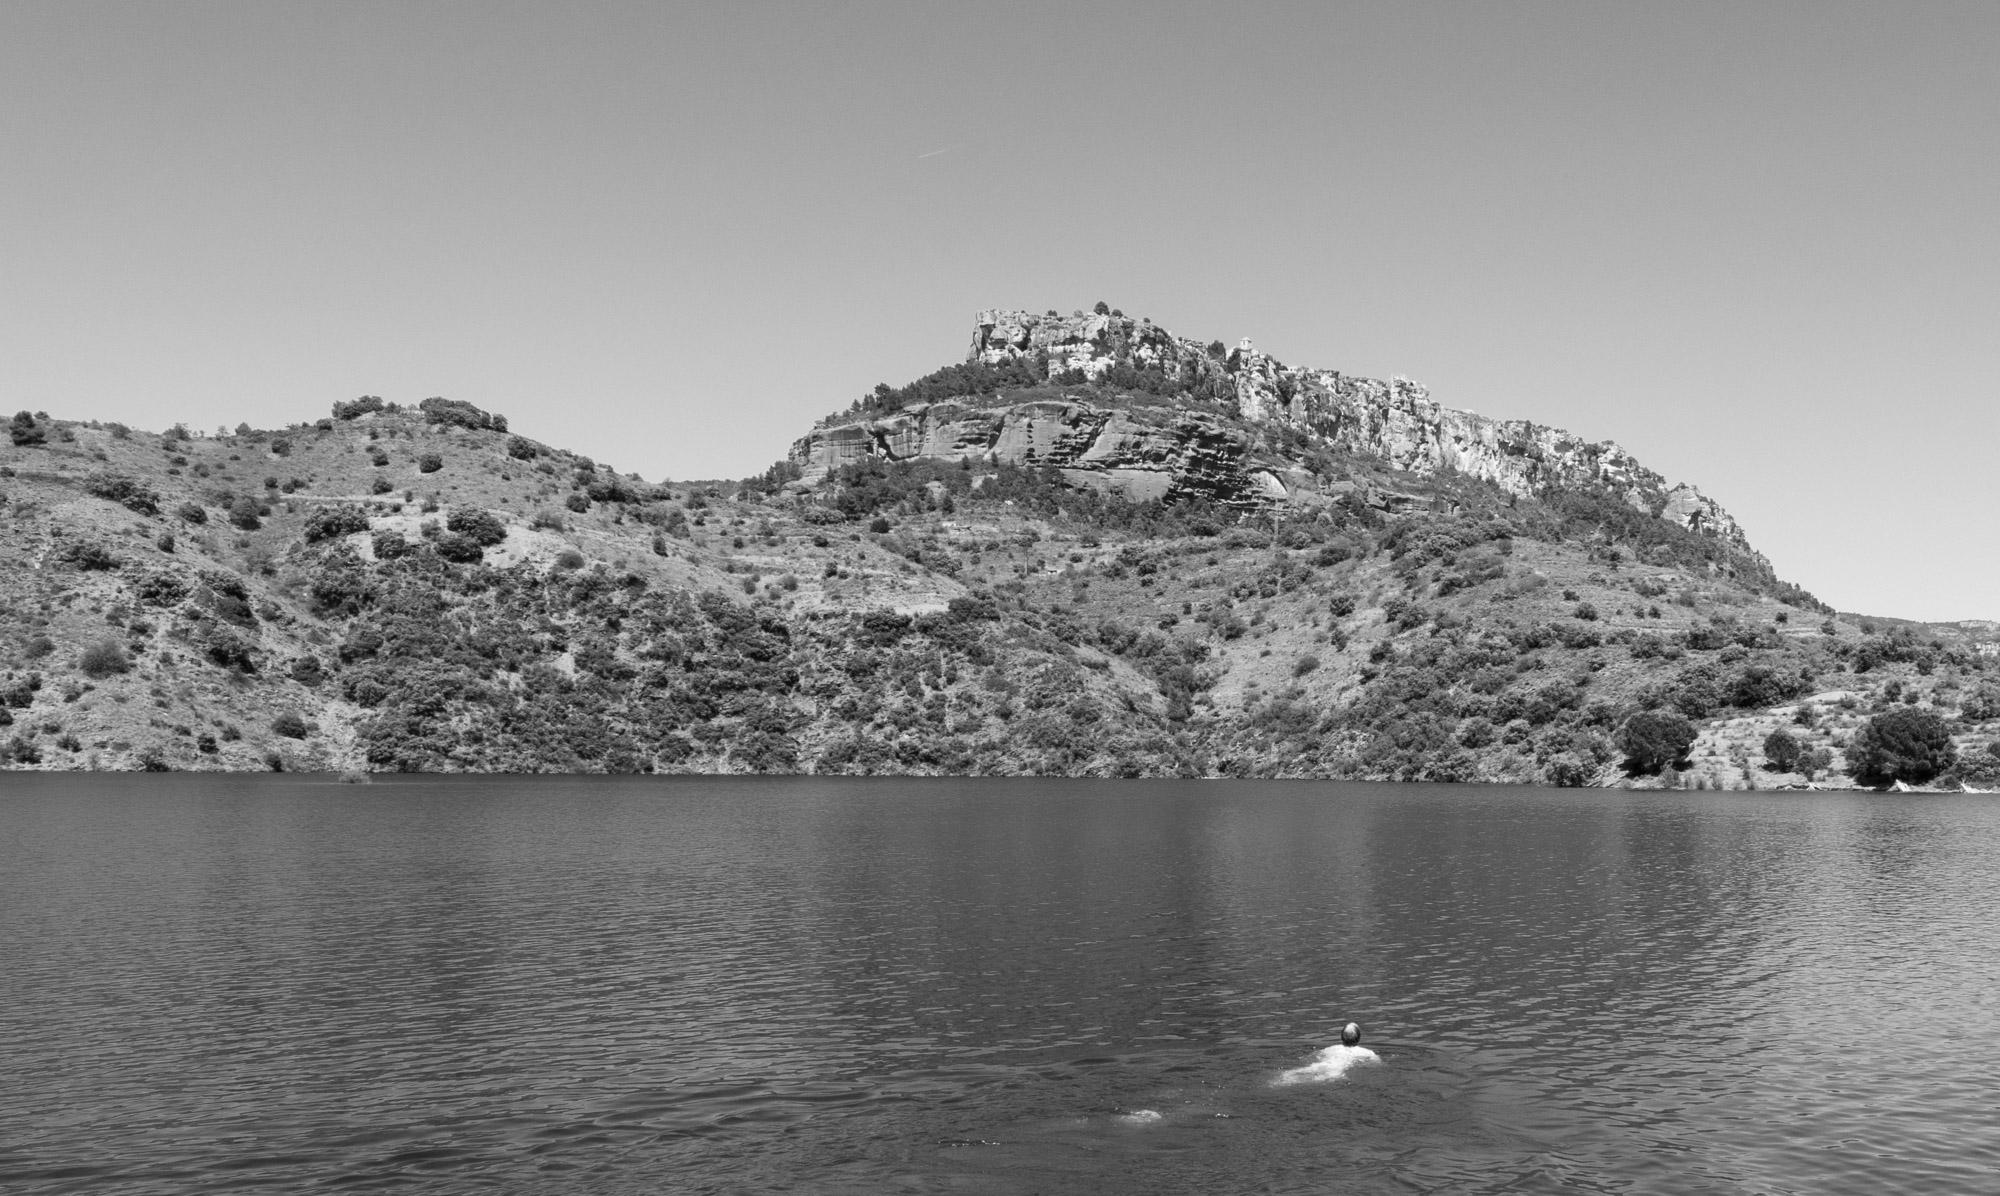 Siurana's Reservoir